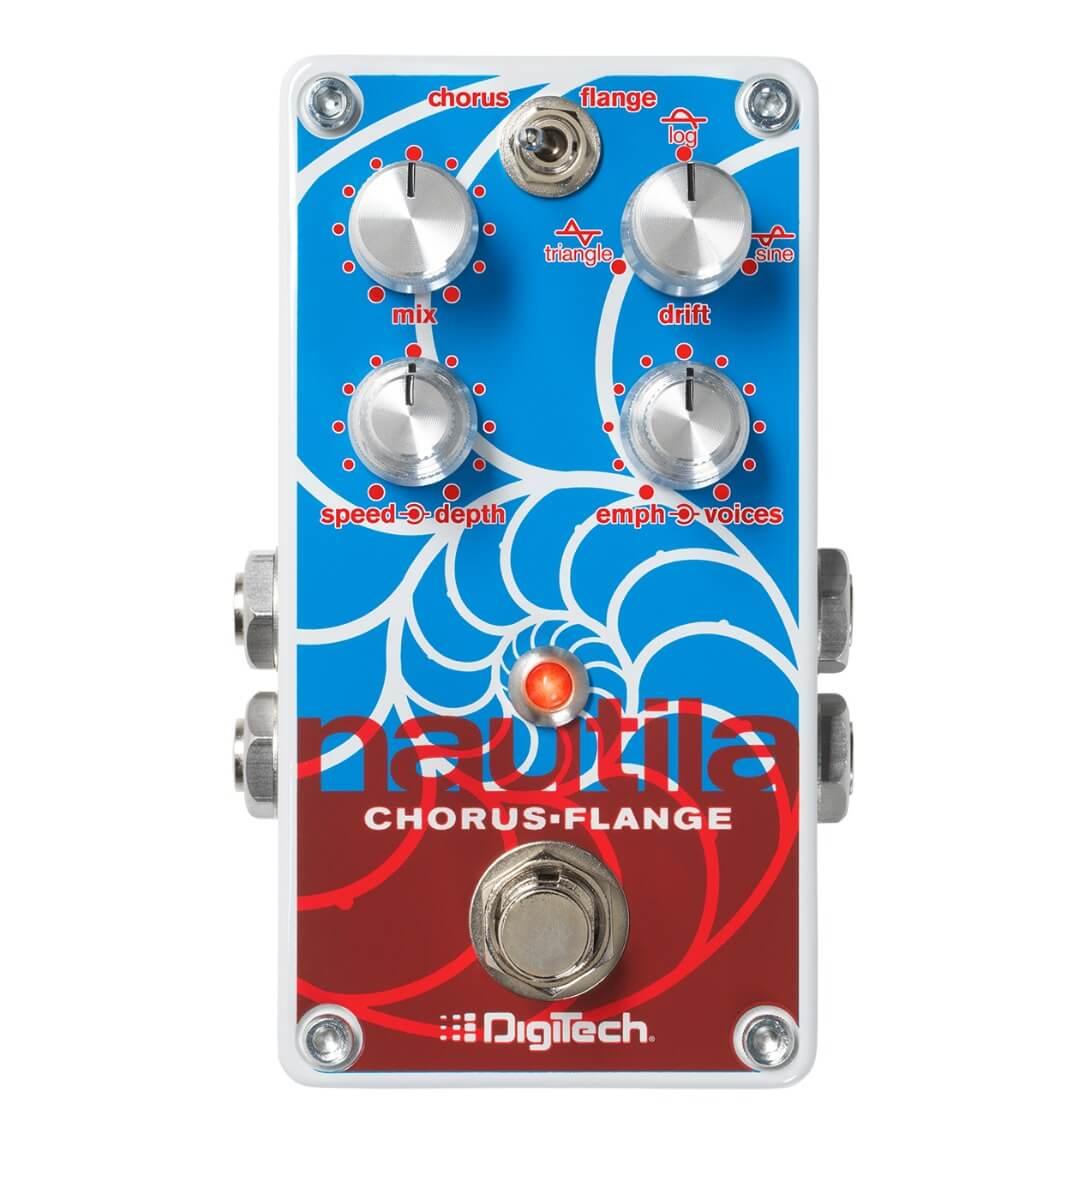 Digitech Nautila guitar-effekt-pedal